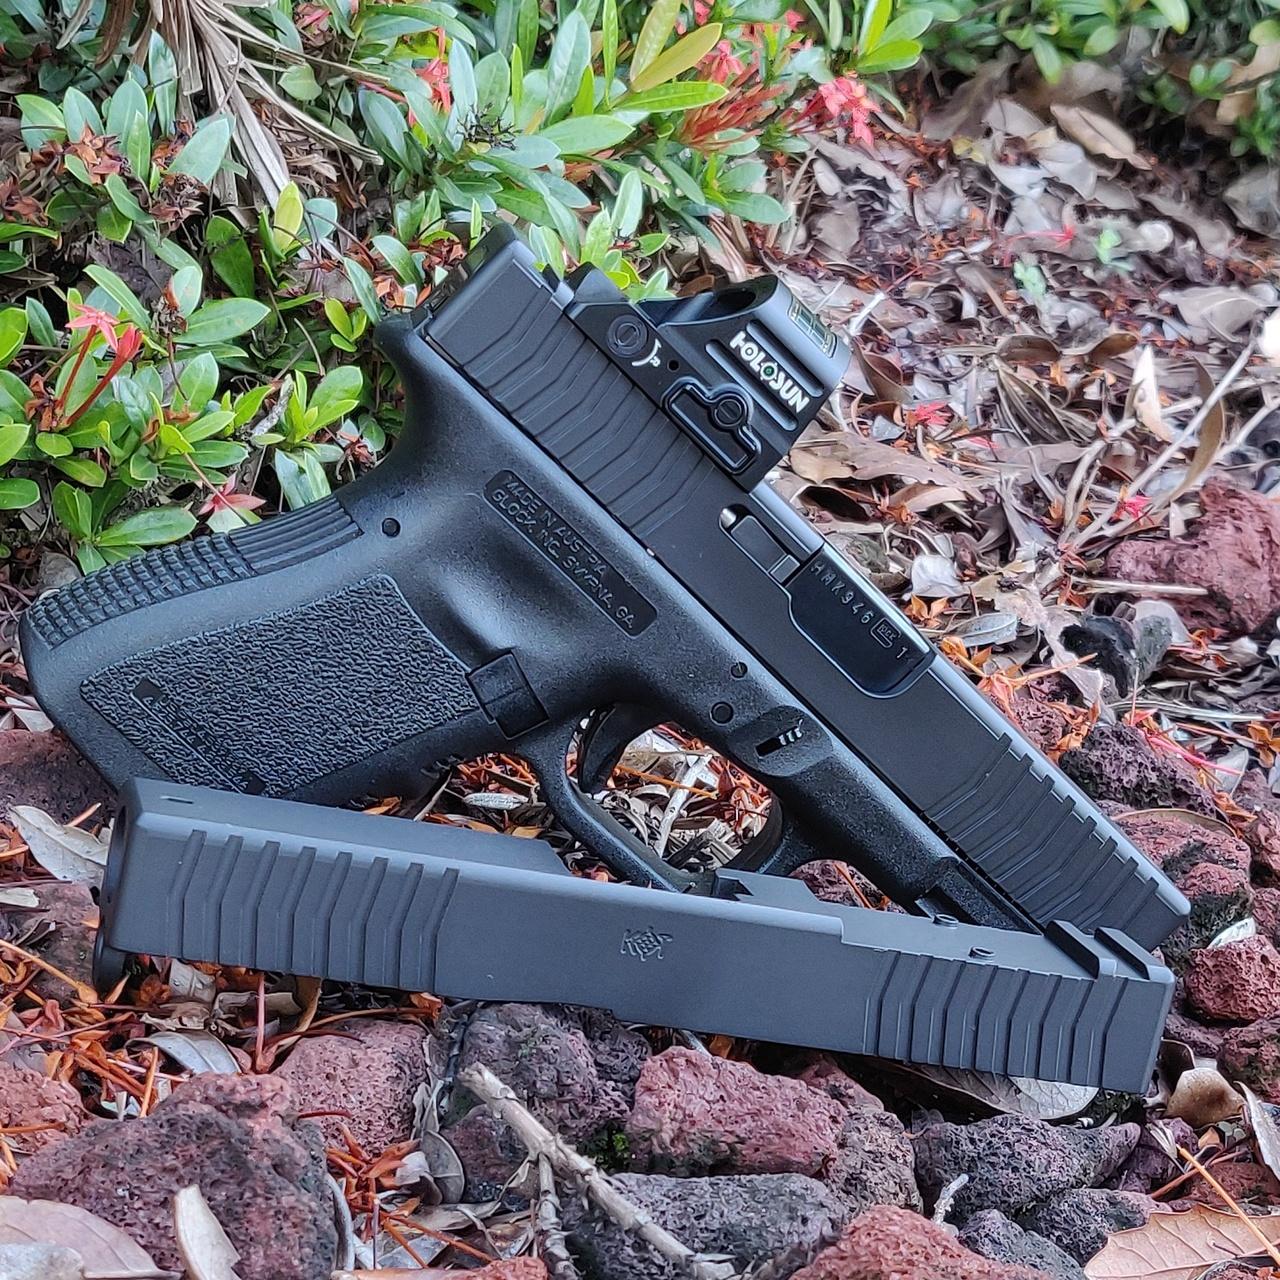 kineti-tech custom glock 19 slide rmr cut front serrations 9mm